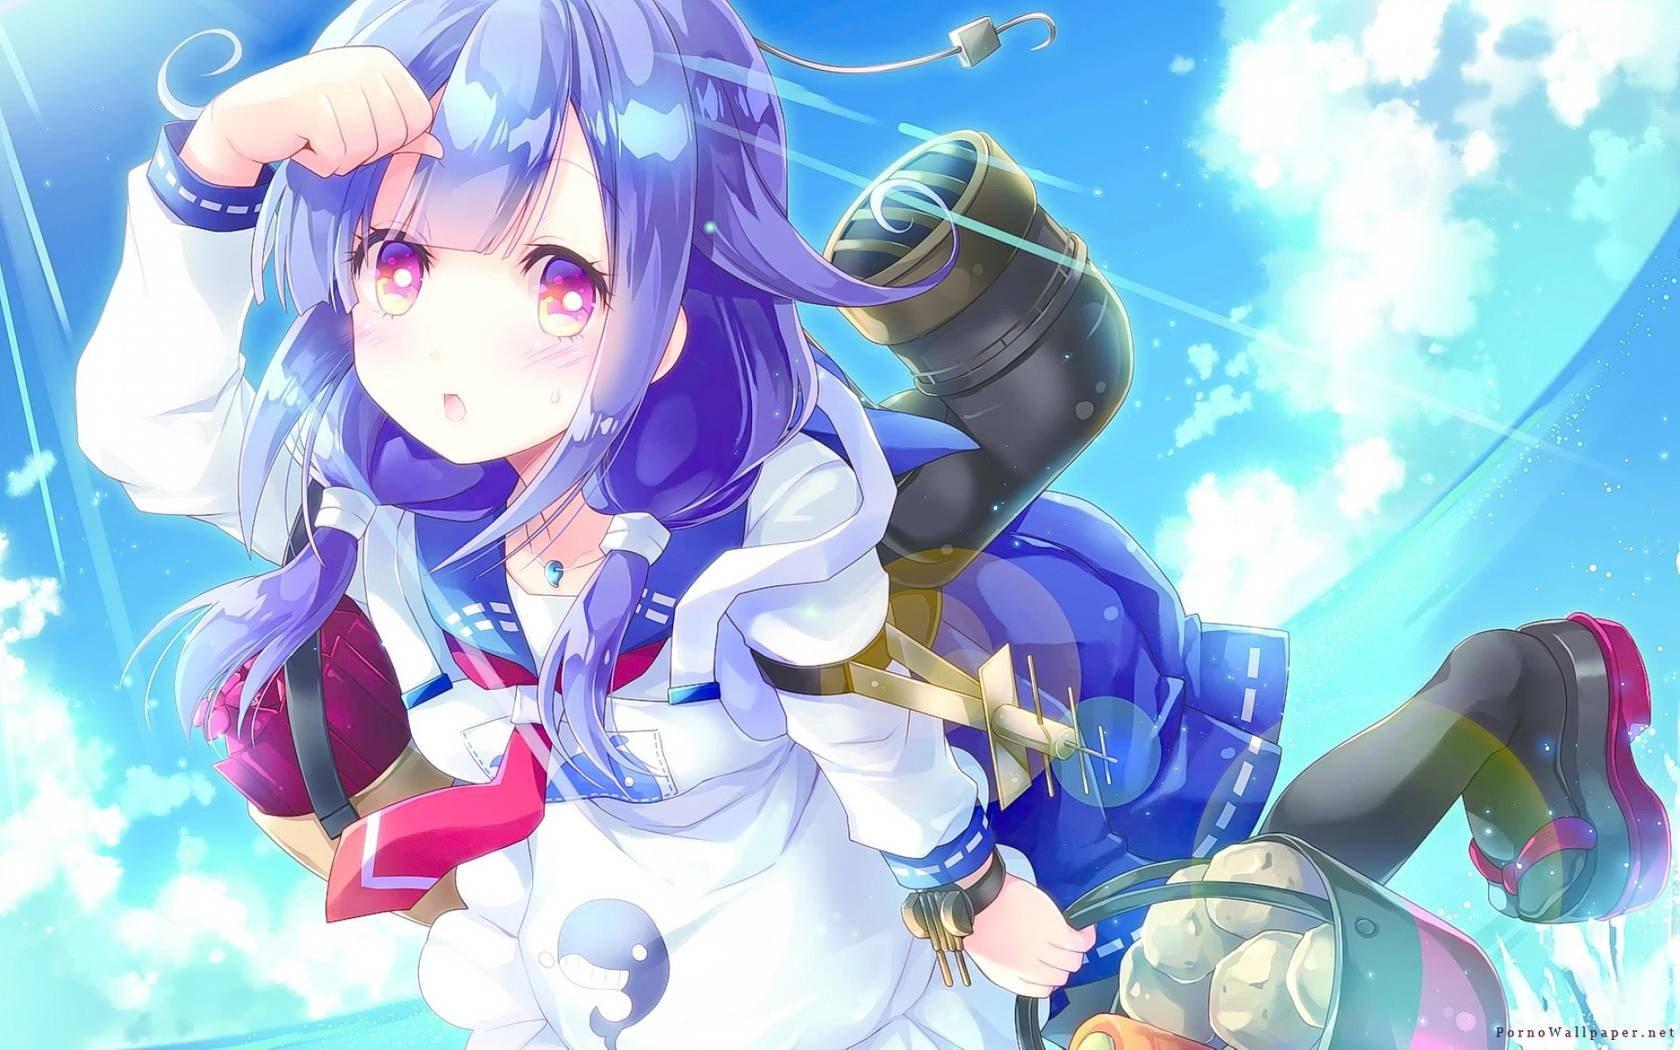 1680x1050 Px Anime Girls Blue Hair Ornament Kantai Collection Long Purple Eyes Taigei